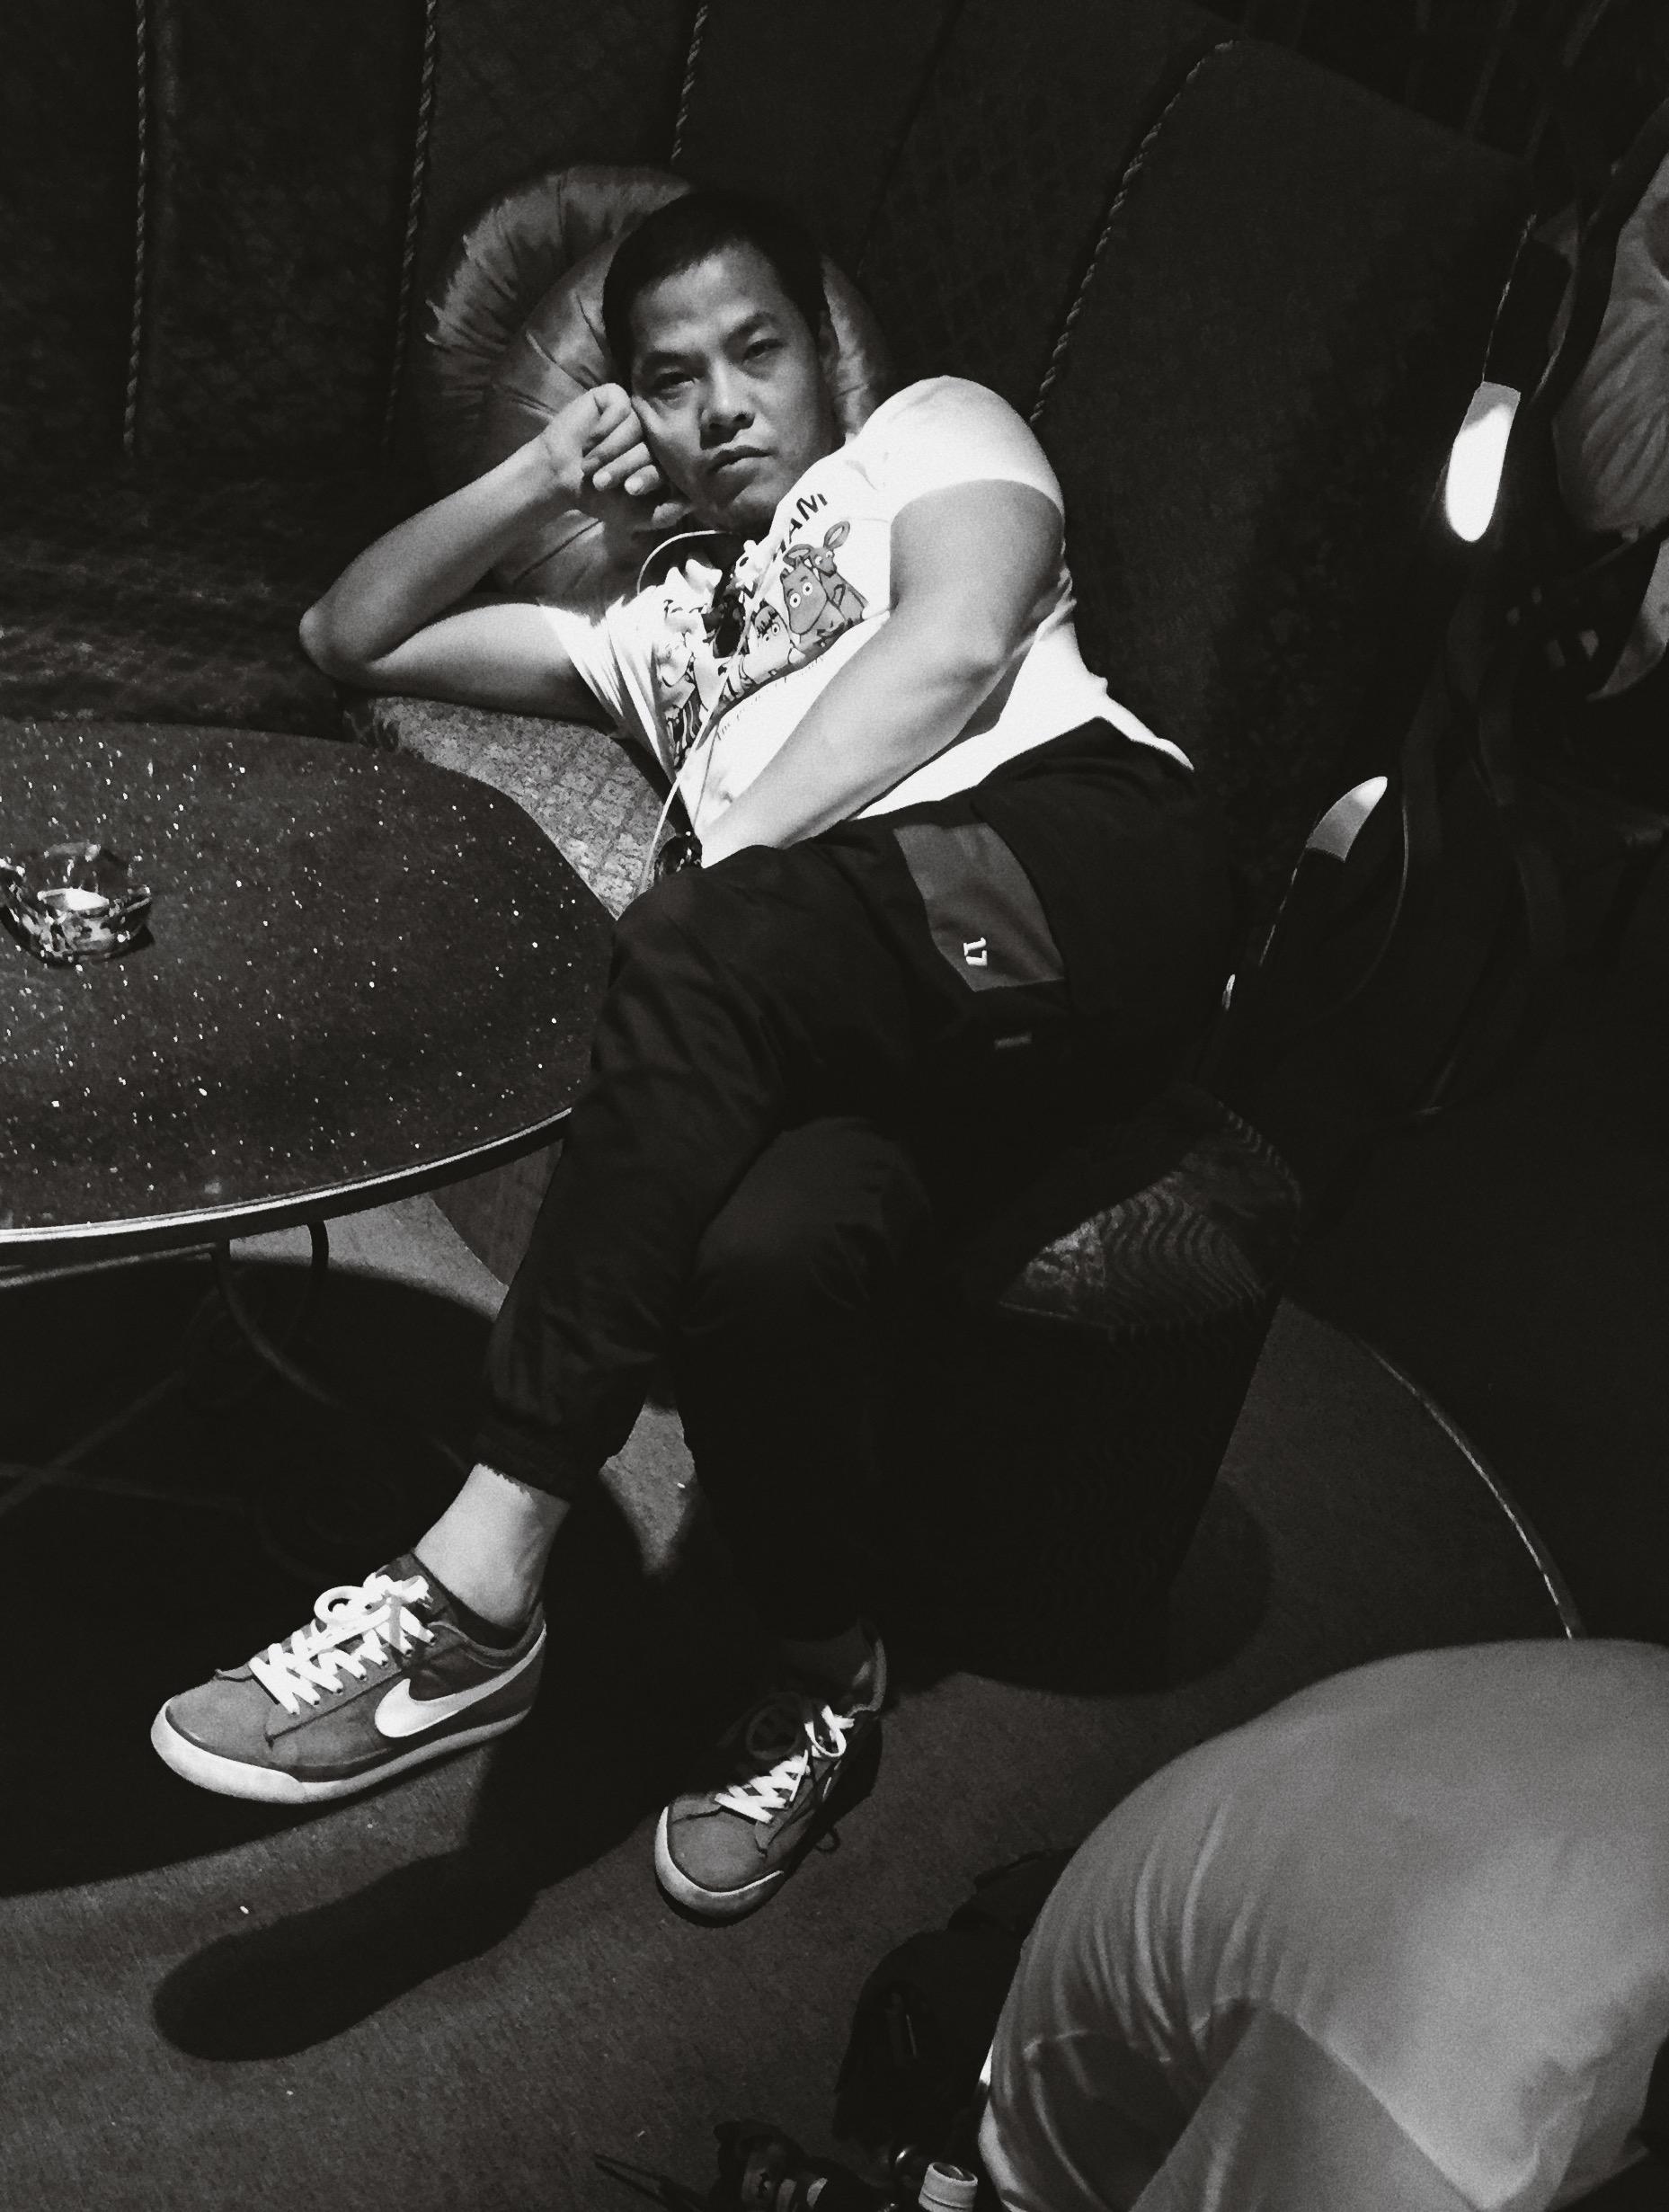 Props guy reclining